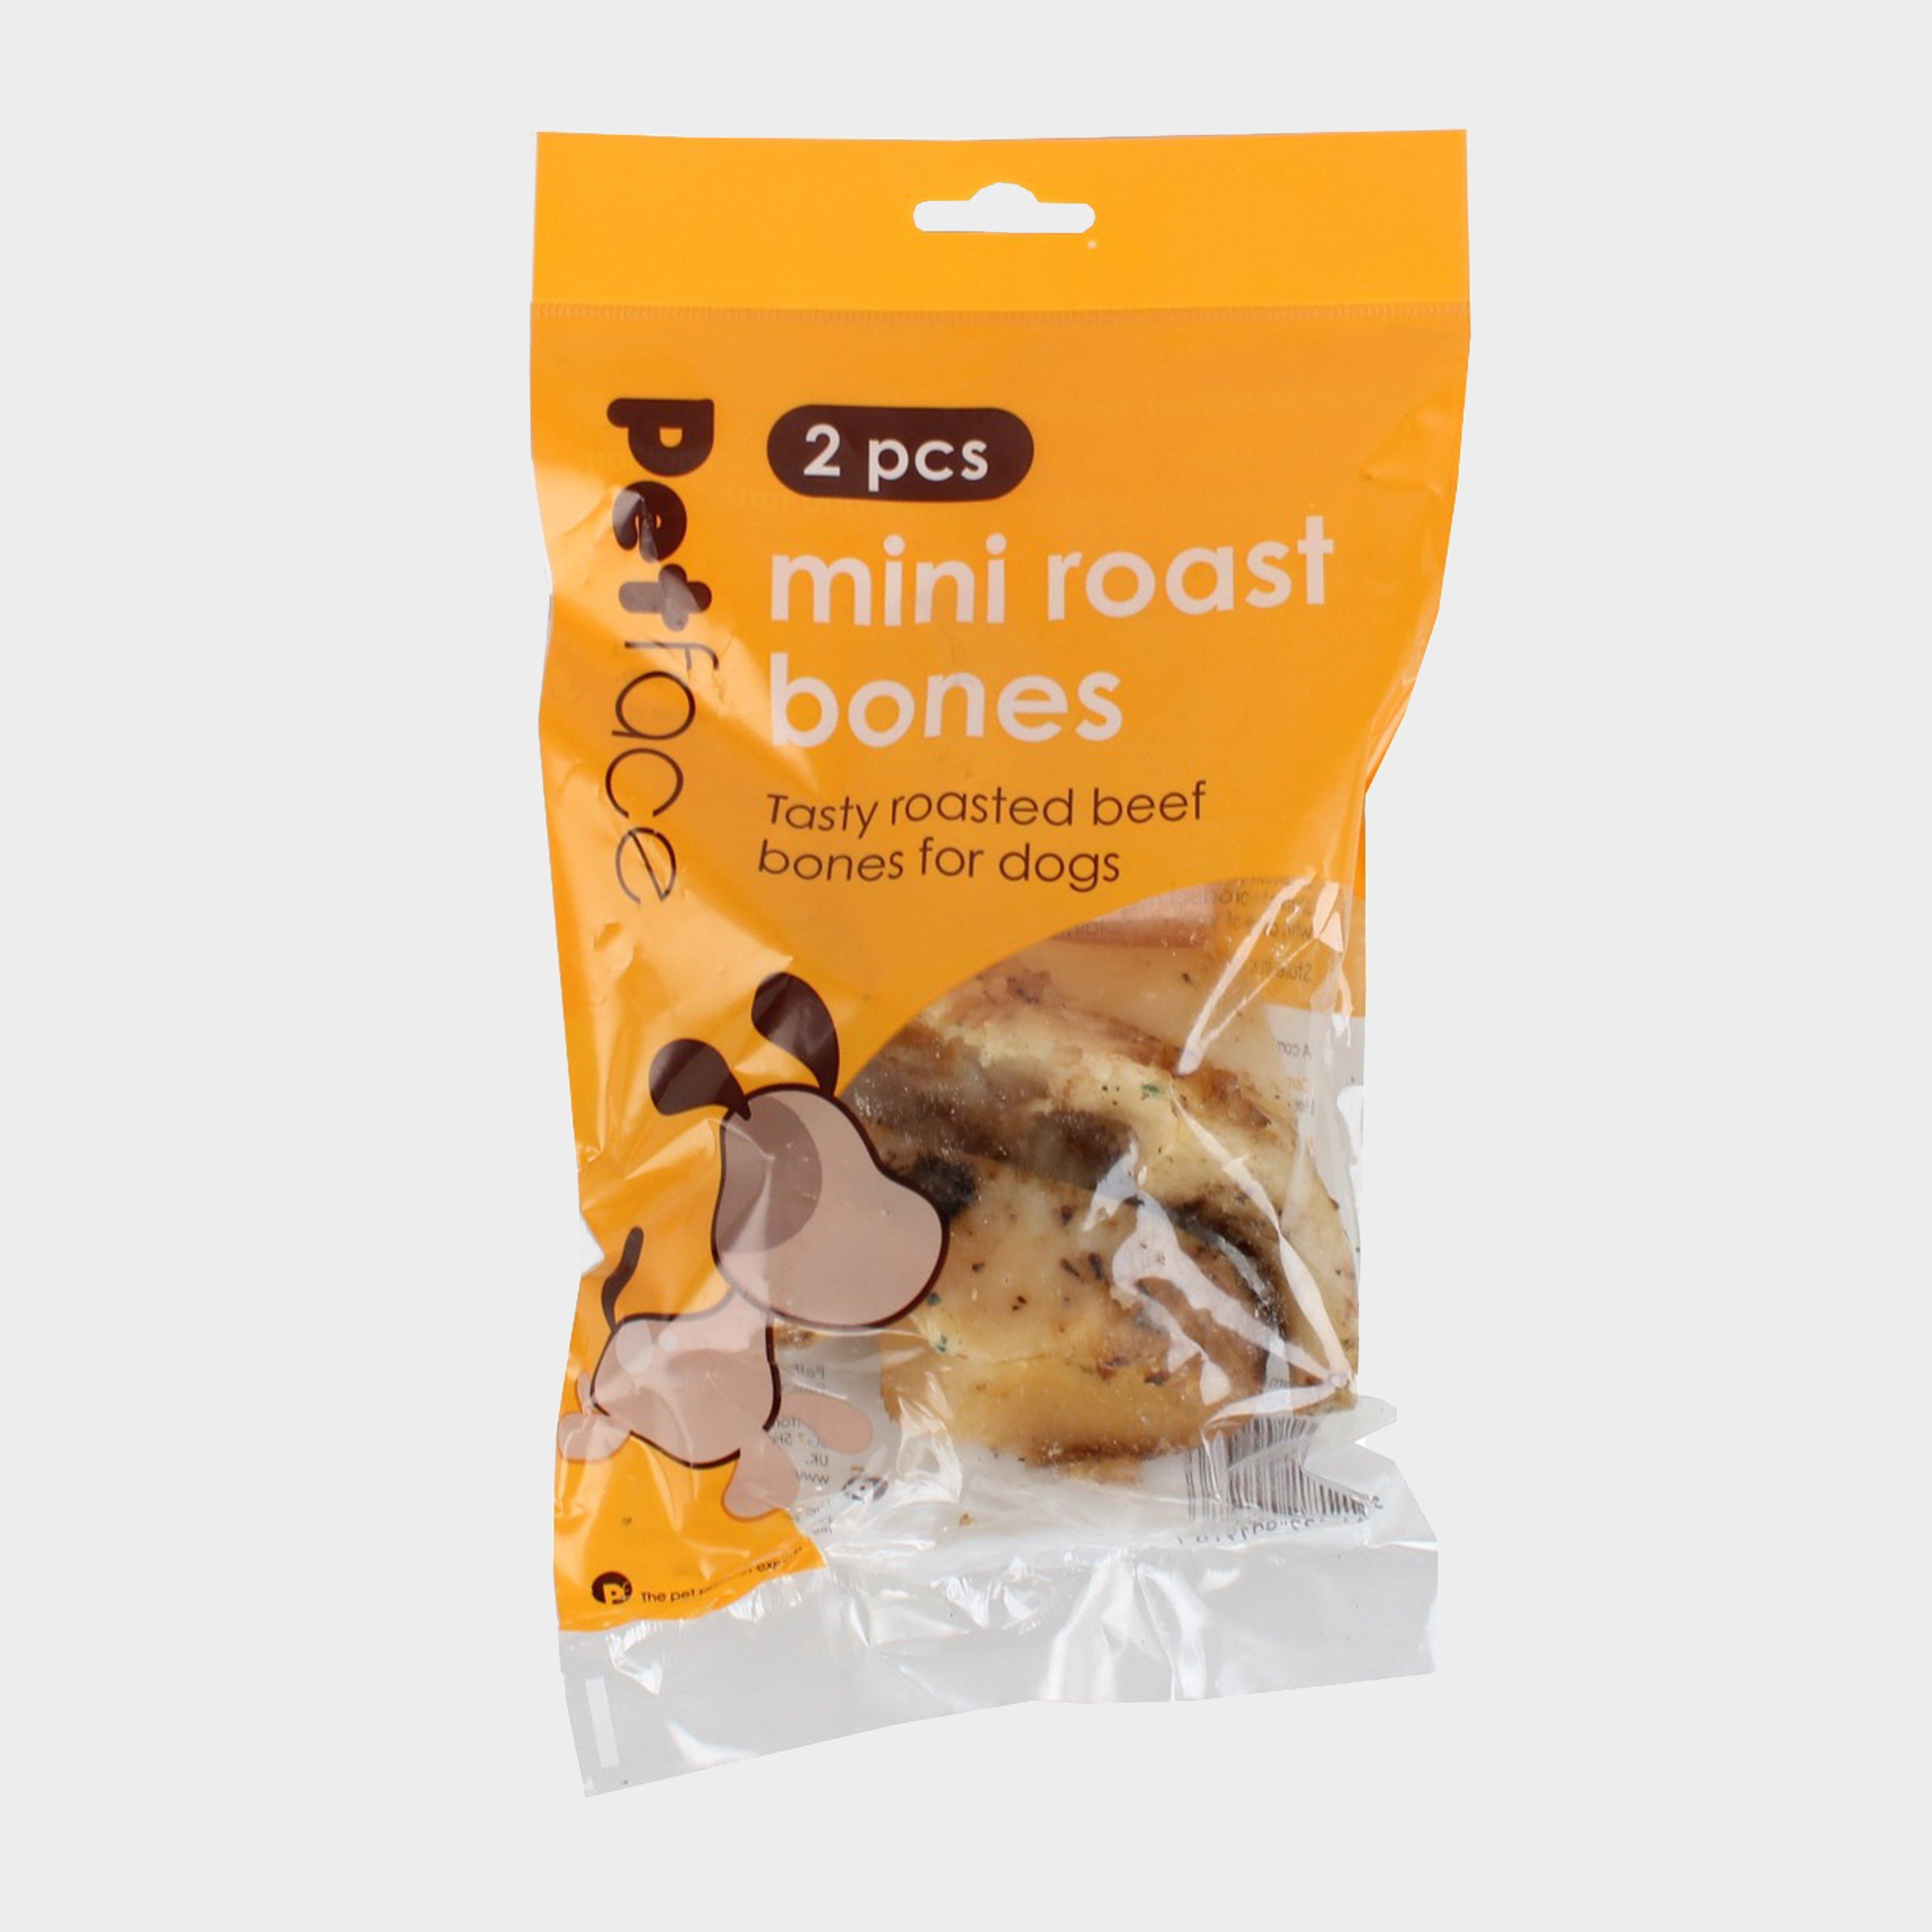 Image of Petface Mini Roast Bones - Assorted/Assorted, ASSORTED/ASSORTED